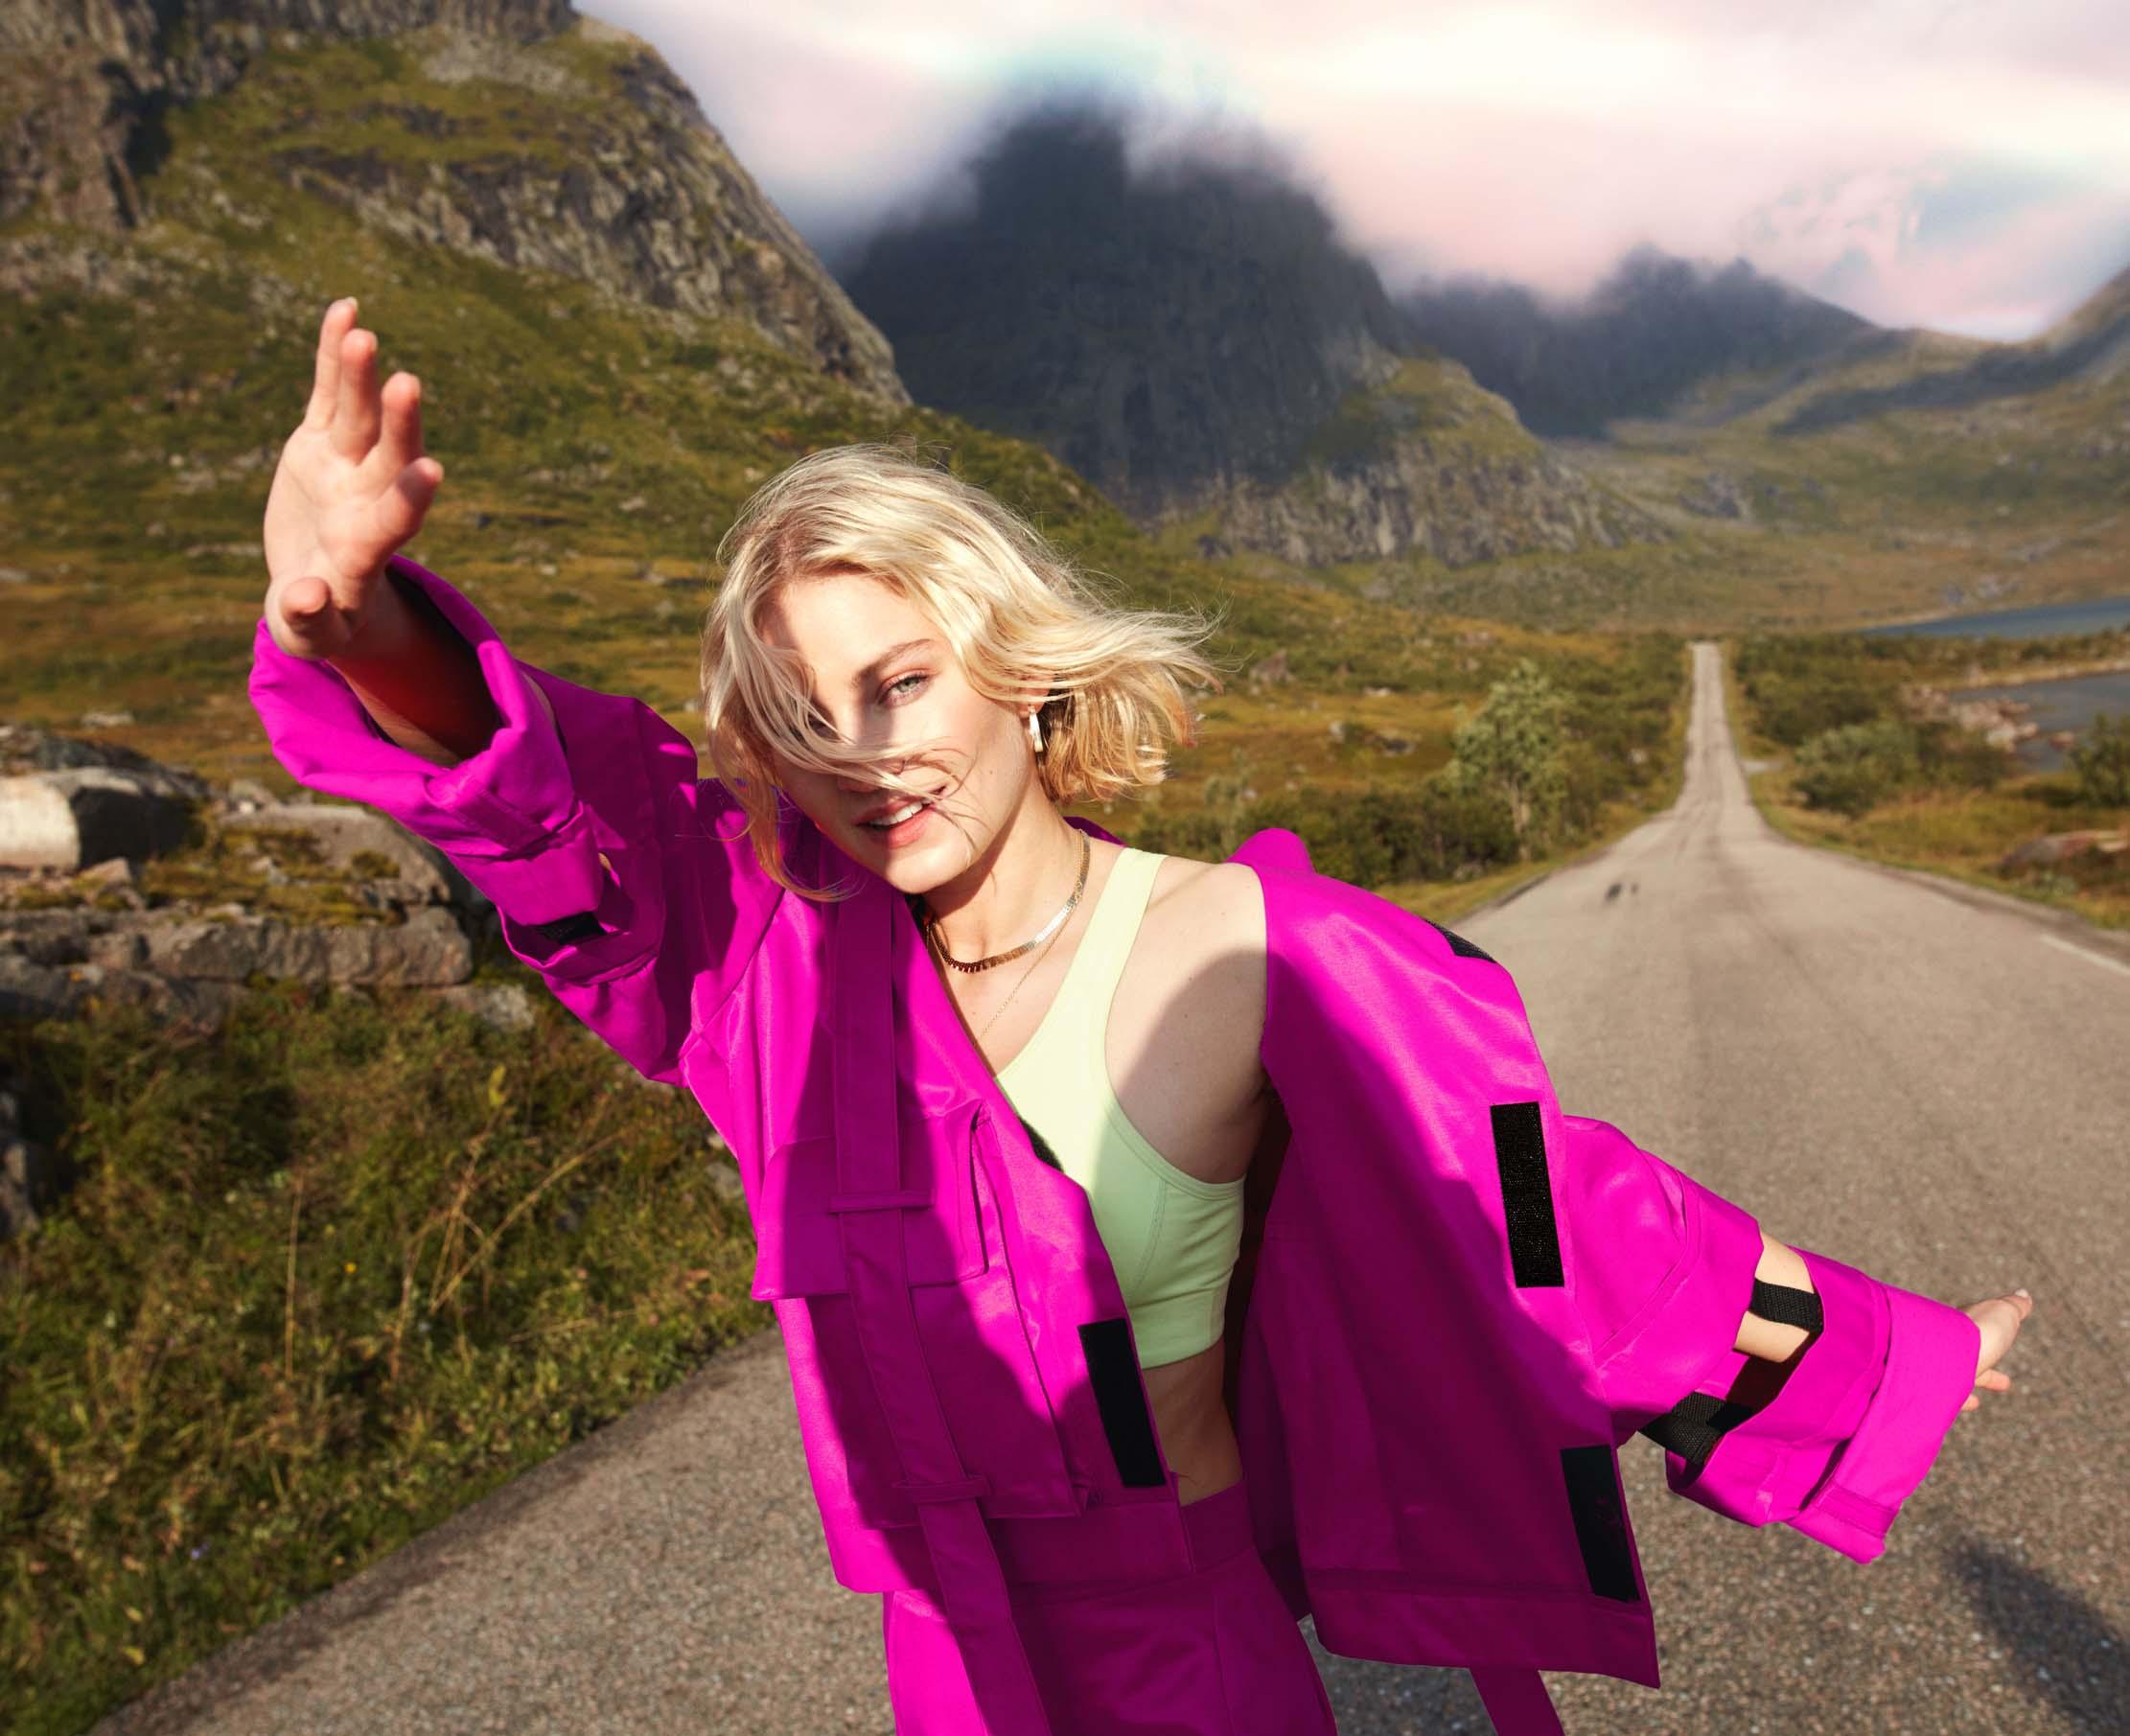 Astrid S vil danse danse danse (Janne Rugland/Universal)